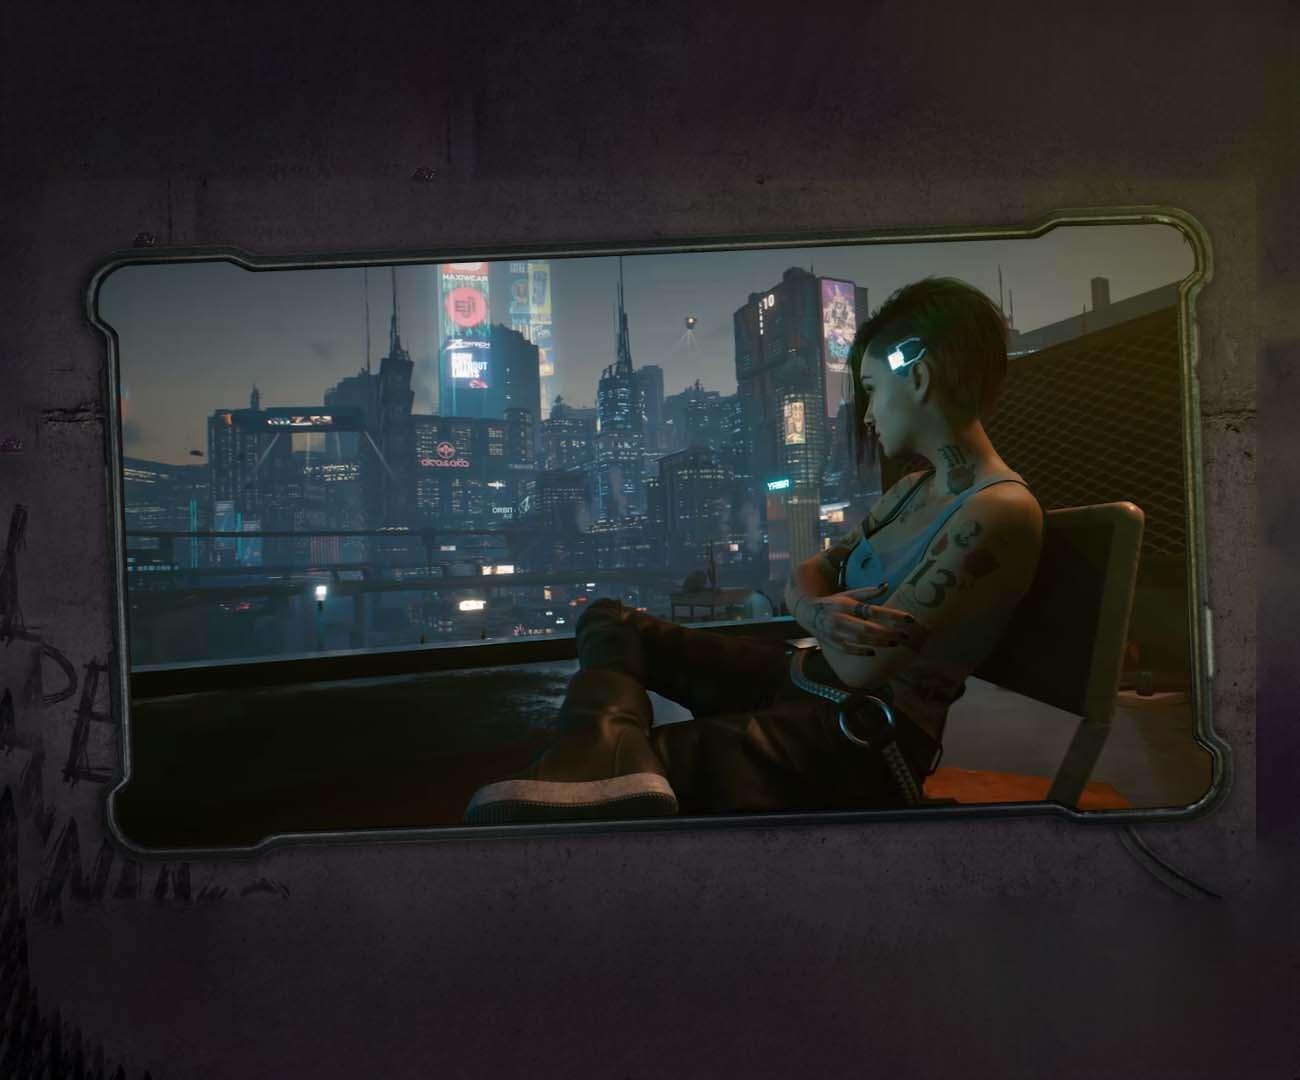 Darmowe DLC do Cyberpunk 2077 opóźnione